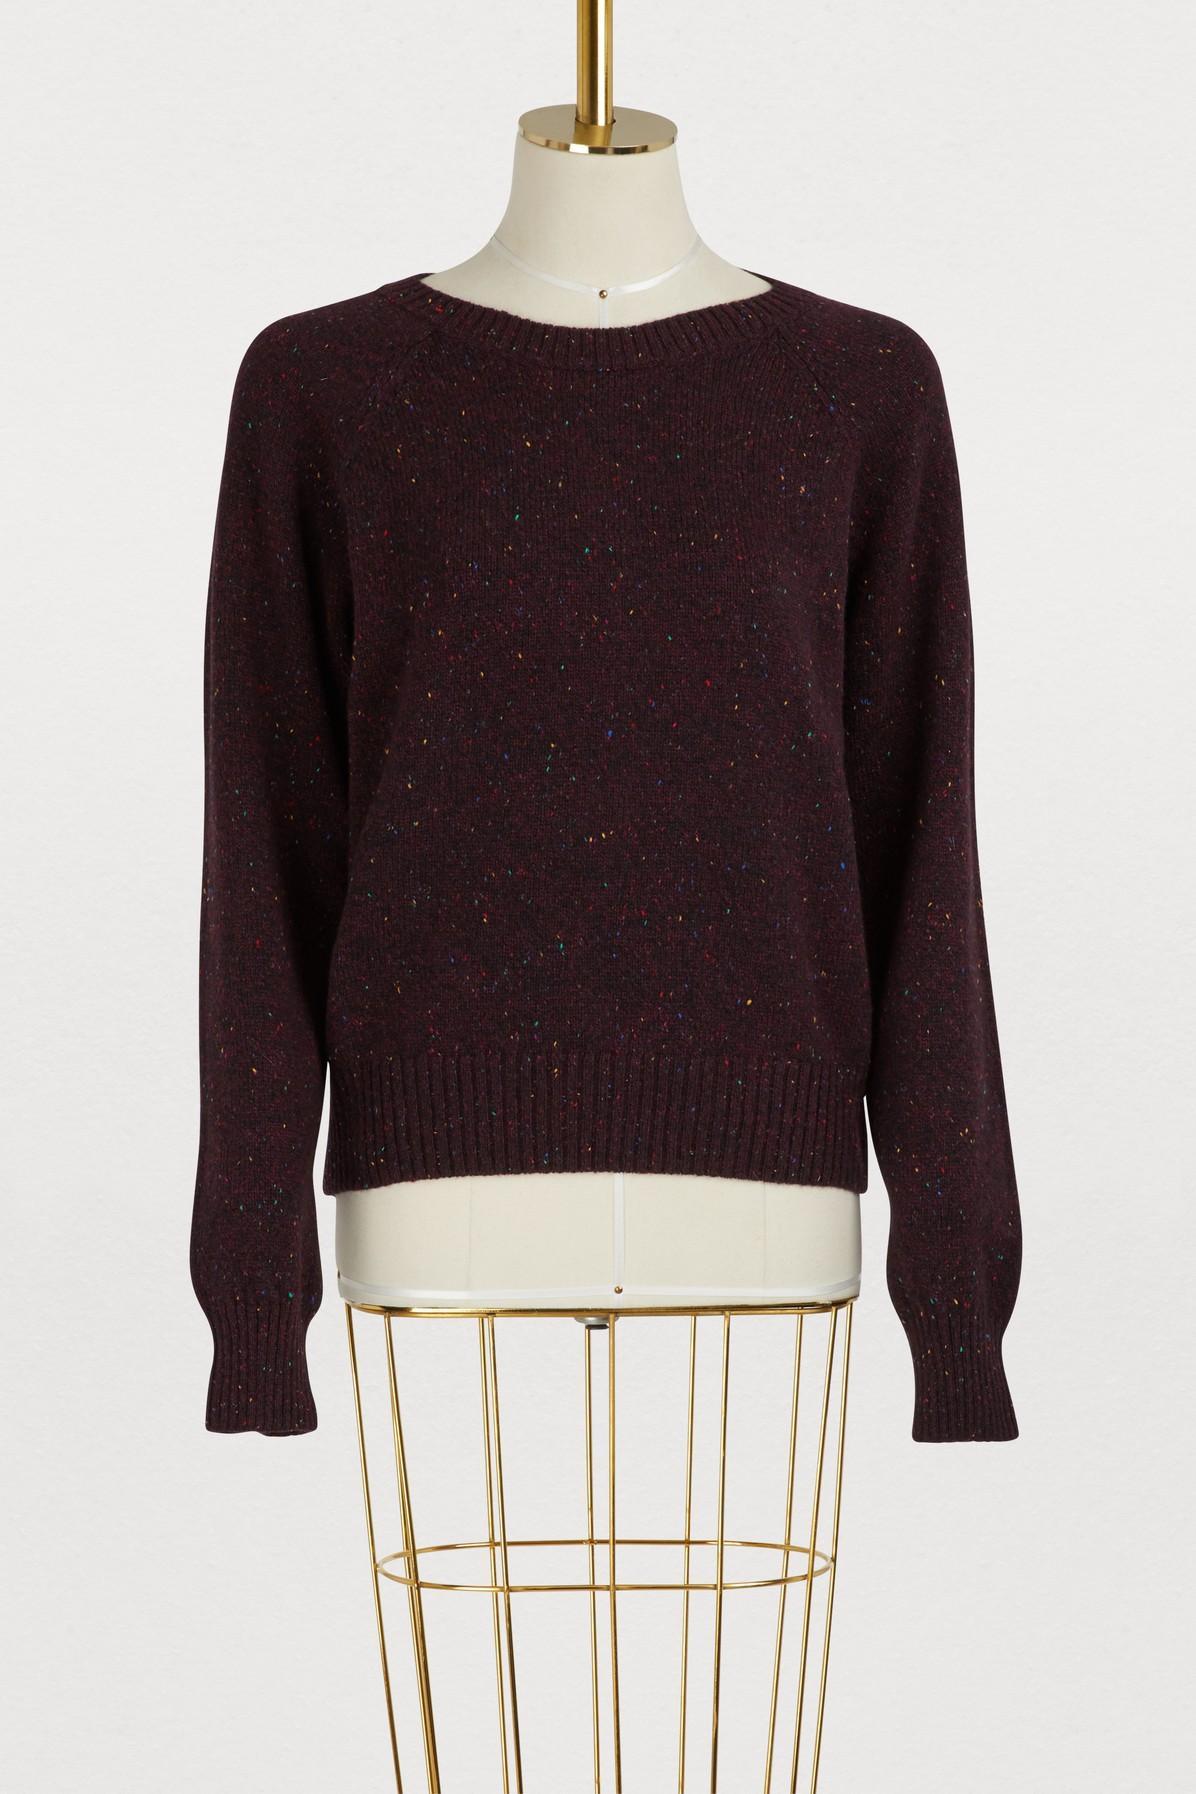 A.p.c. Striling Sweater In Lie De Vin